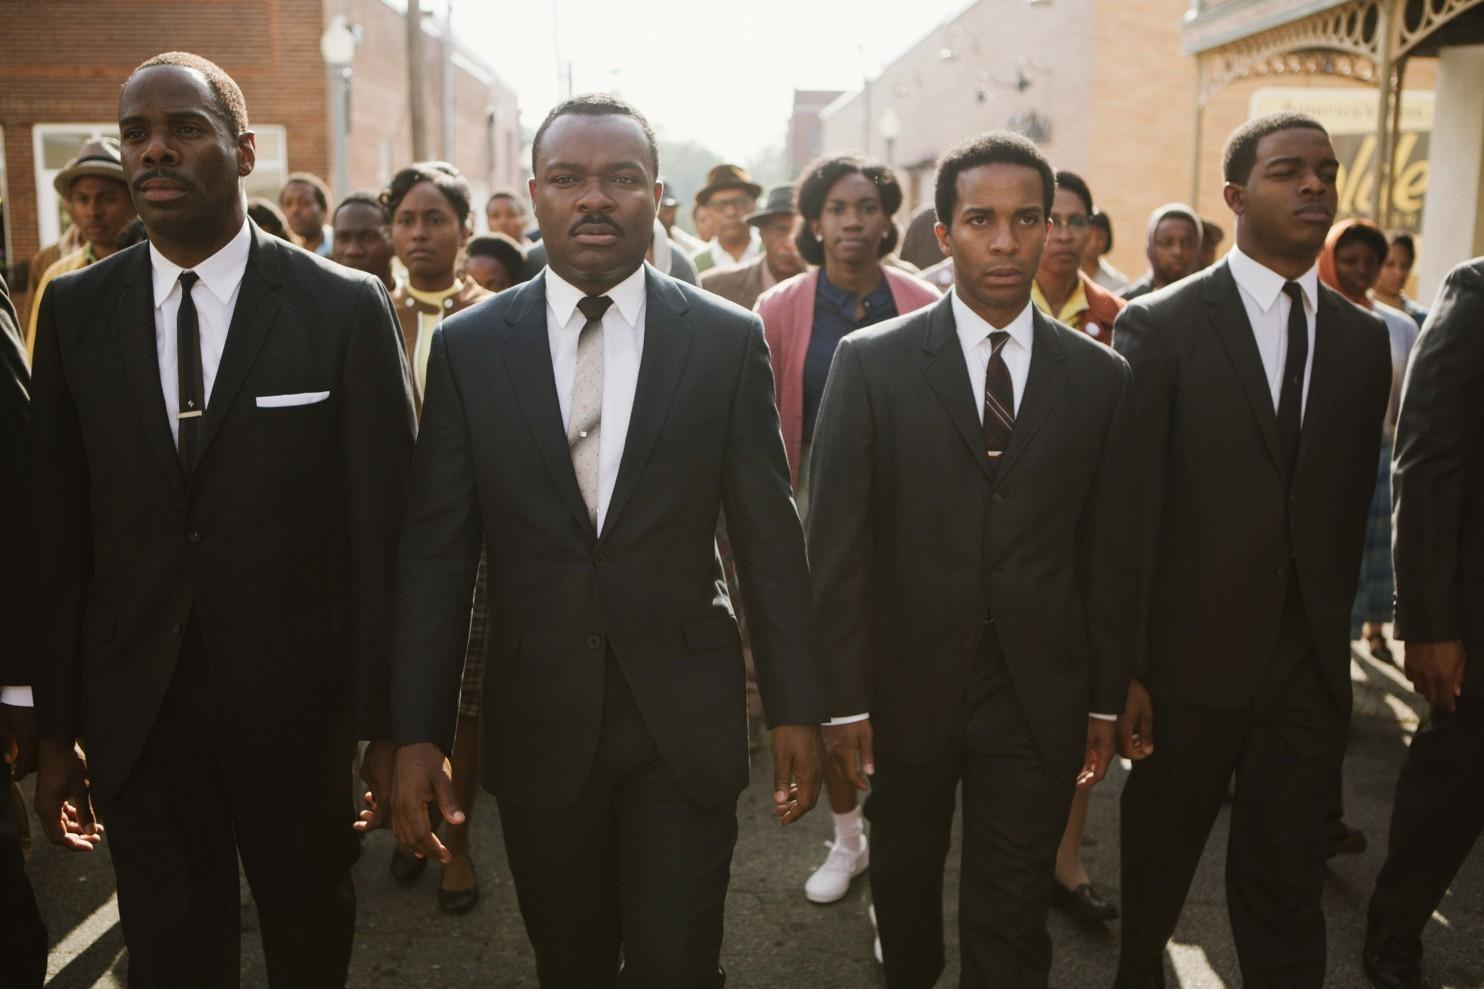 Protest march in the film Selma